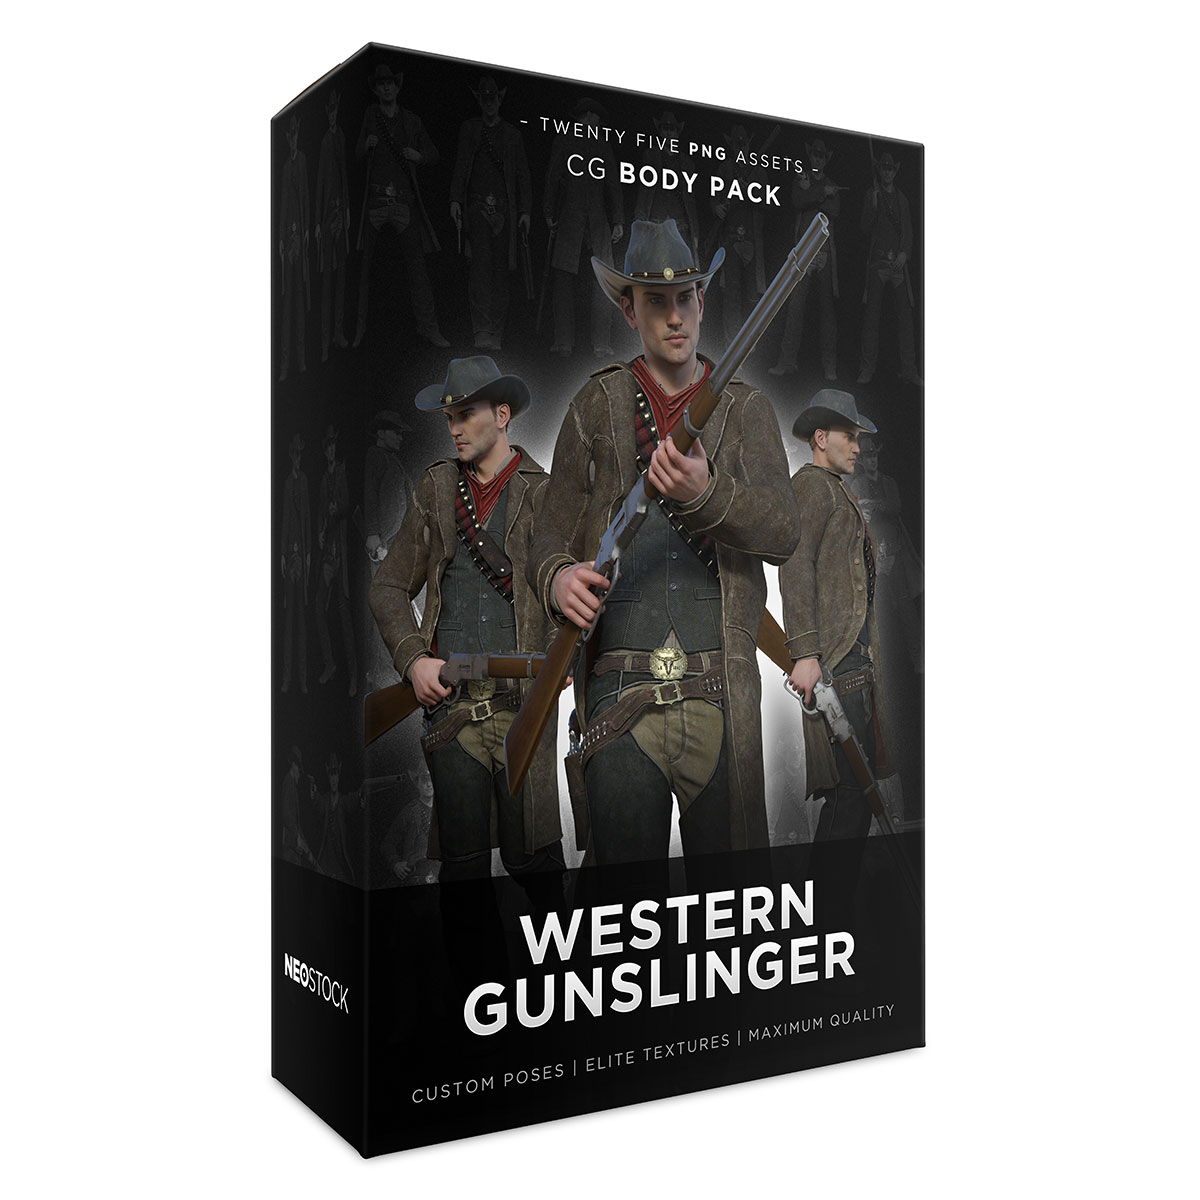 cg western gunslinger product box sales